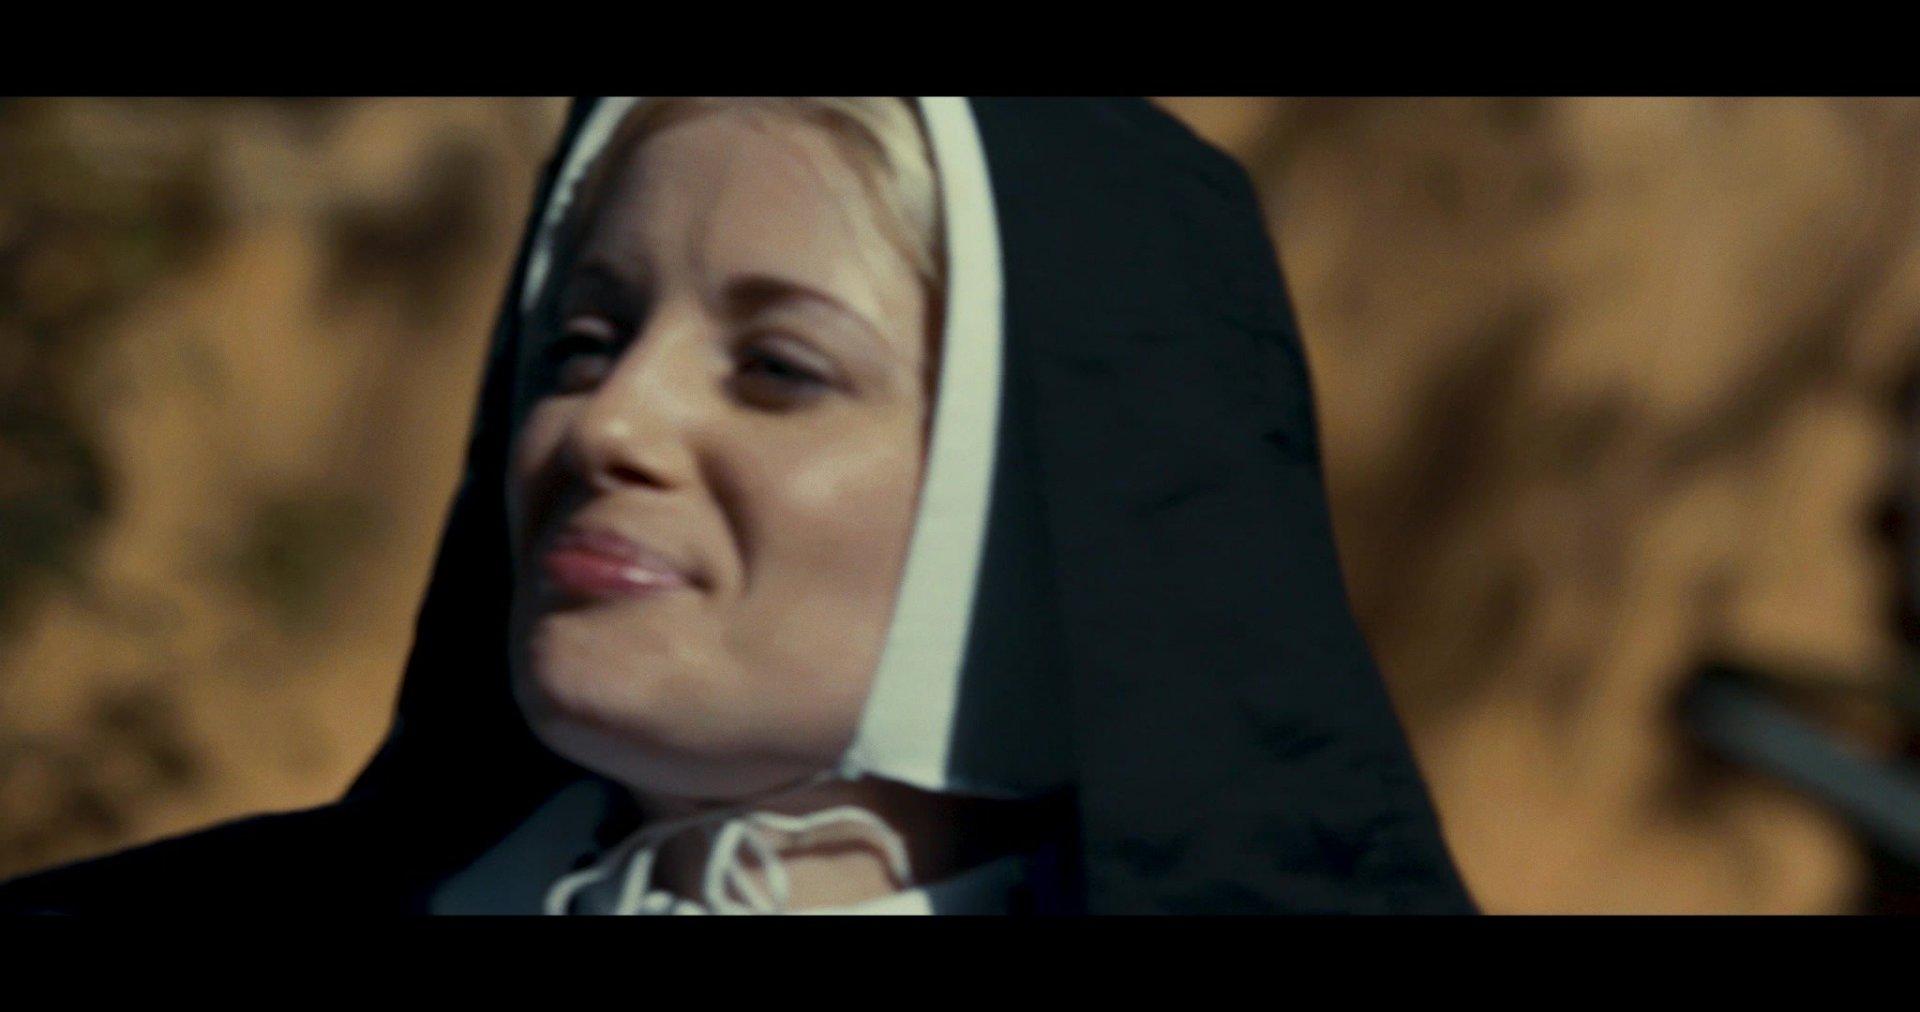 nun adult video free download